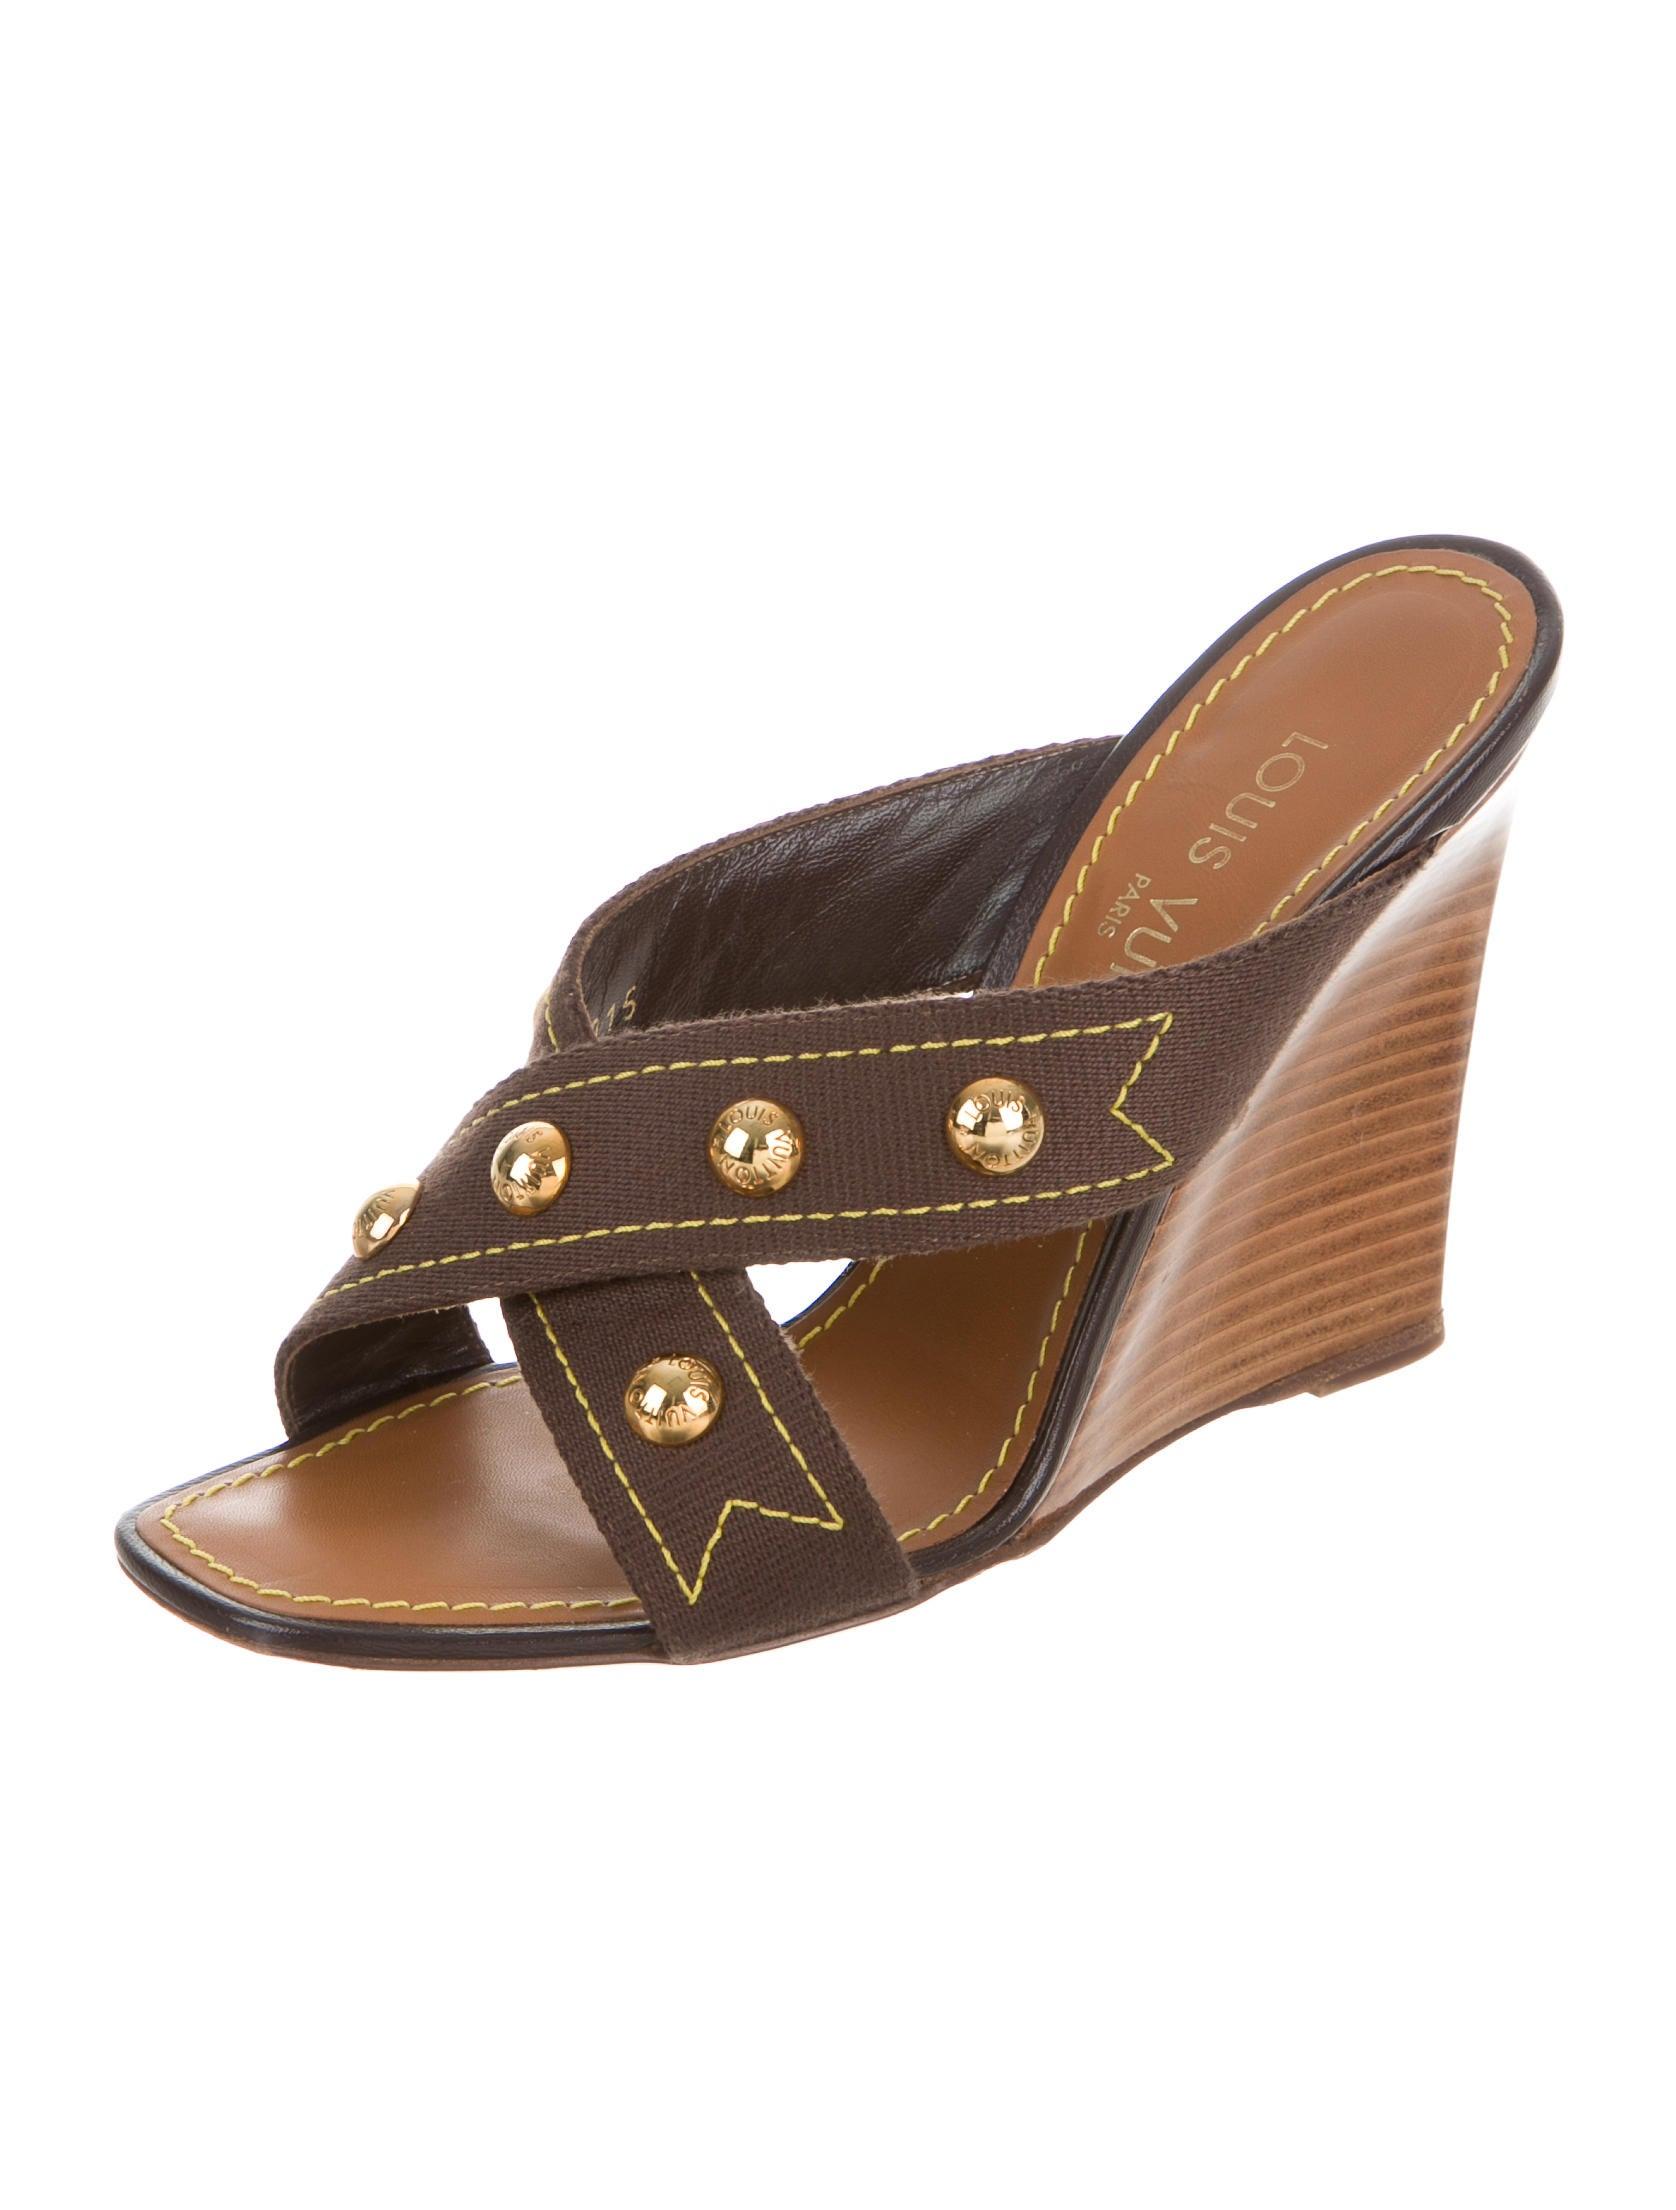 louis vuitton studded wedge sandals shoes lou108678